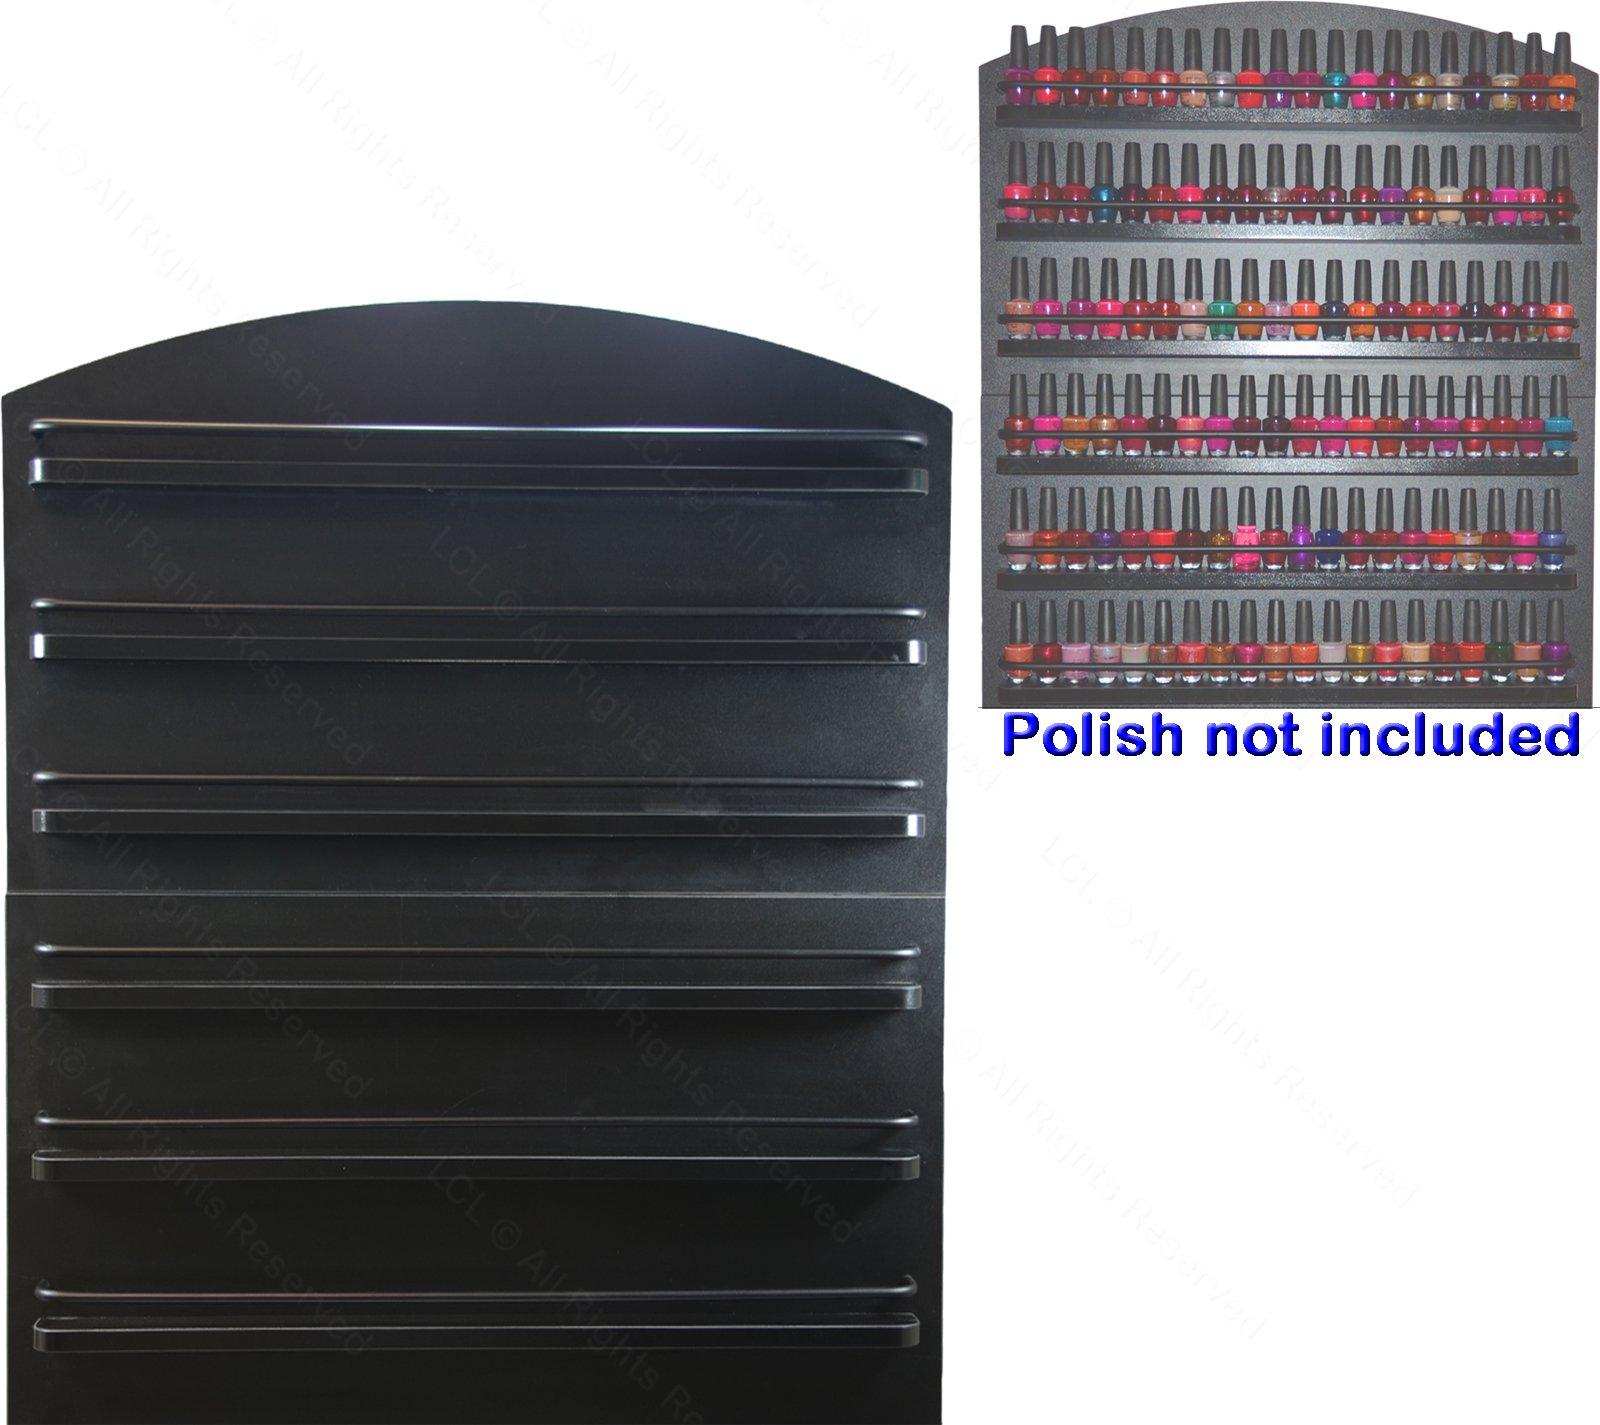 LCL Beauty 6 Tier Black Wall Mount Nail Polish Rack Display Organizer Shelf Salon Spa Beauty Equipment